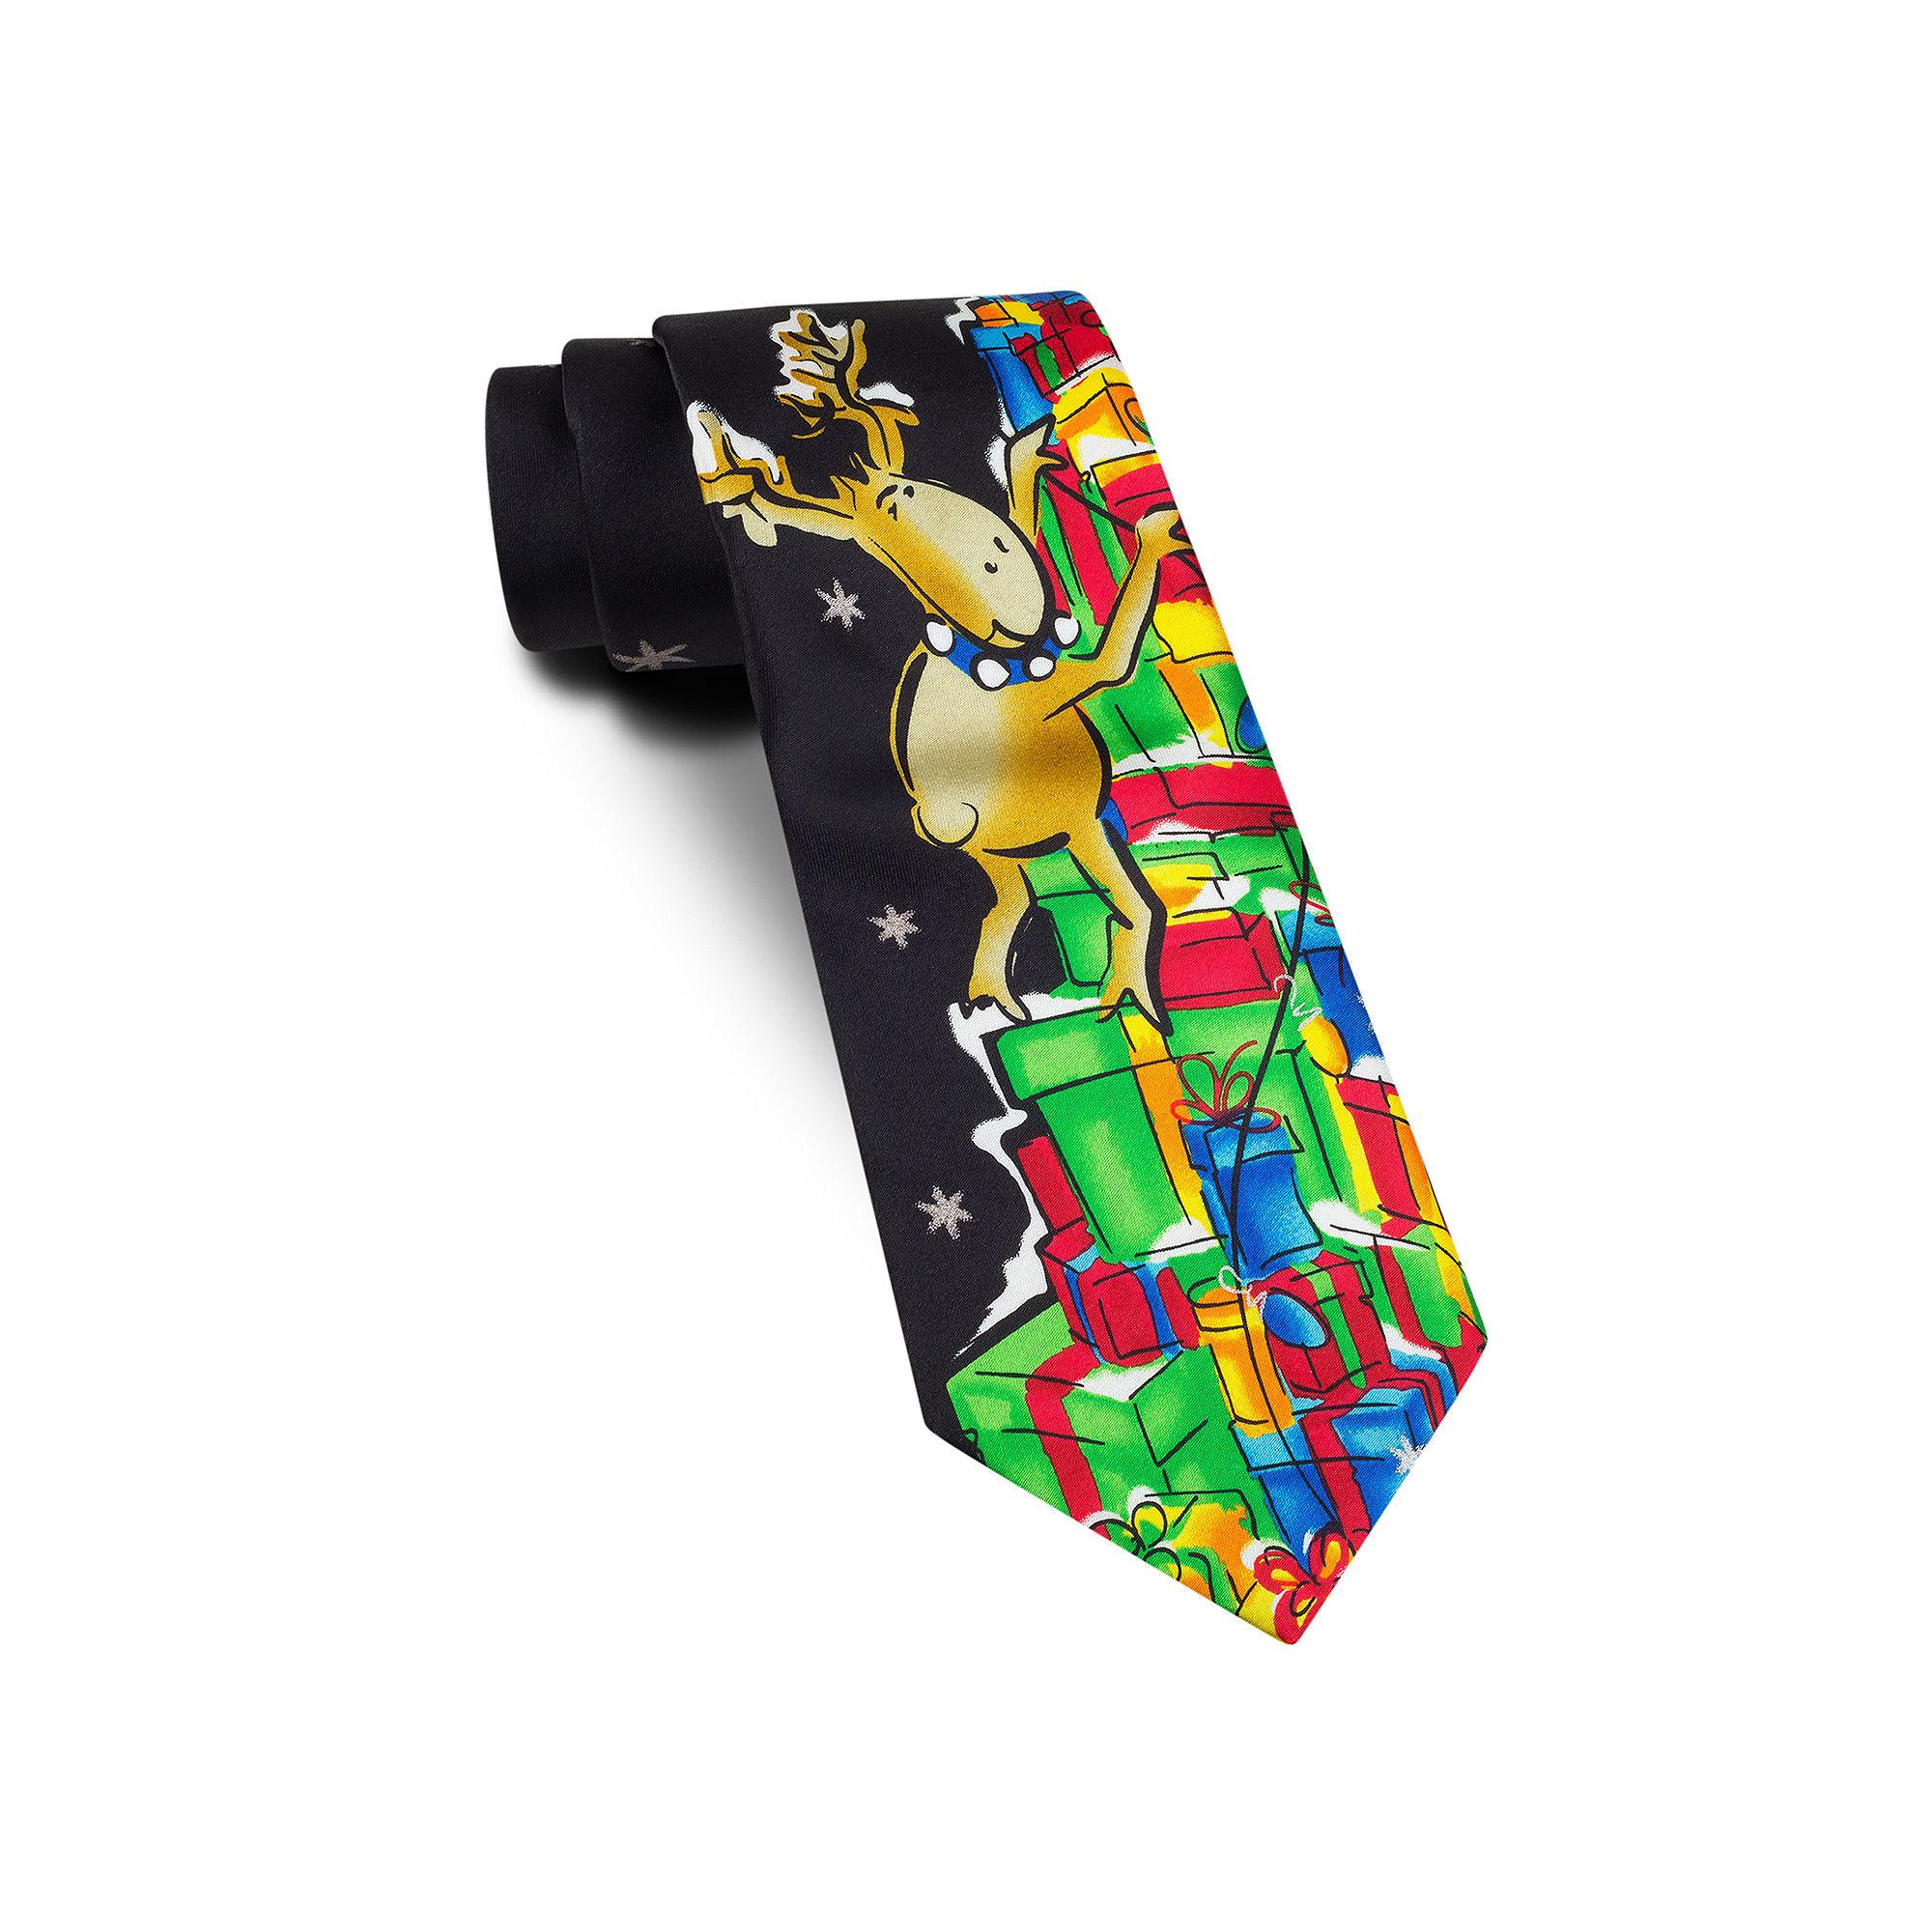 UPC 748763845253 - Jerry Garcia Merry Christmas Tie | upcitemdb.com